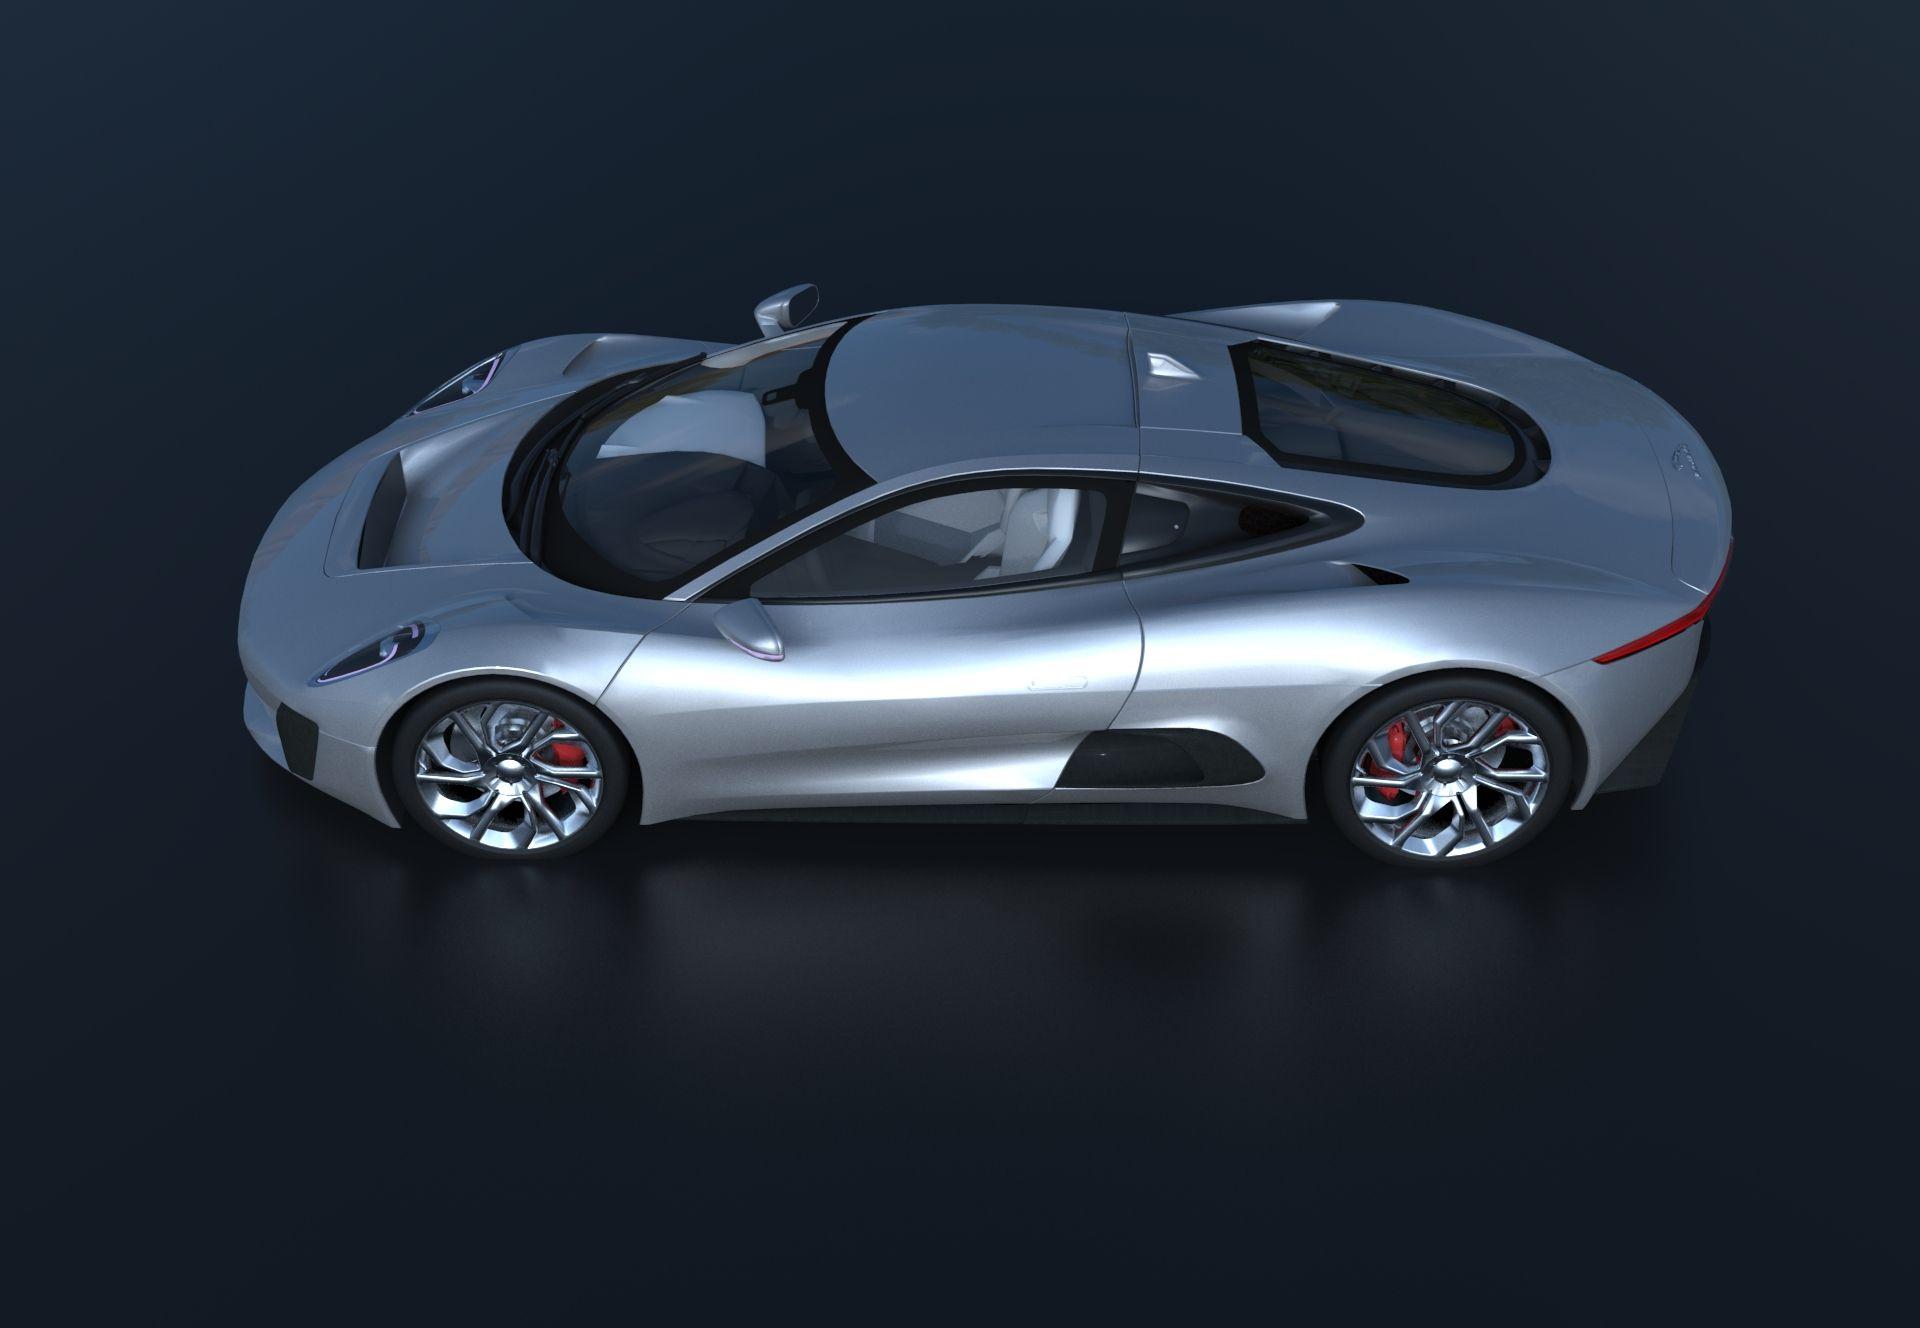 Beau Jaguar CX 75 Renderizado En #Keyshot #3d #render